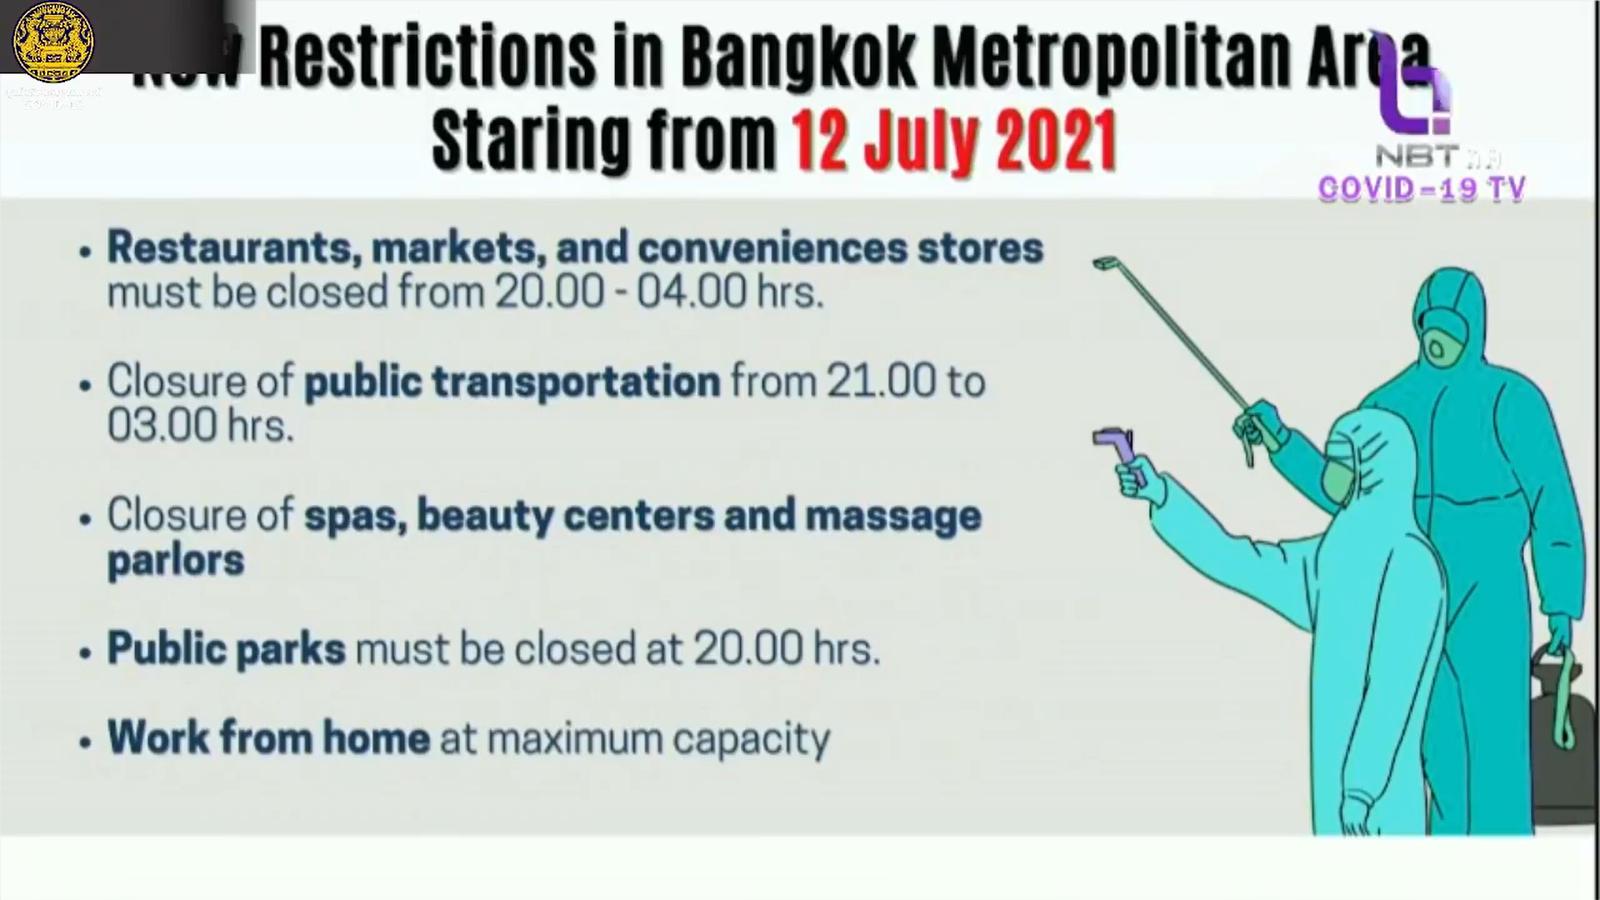 www.thaiguide.dk/images/forum/covid19/nedlukning%20BKK%202%2009-07-21.png